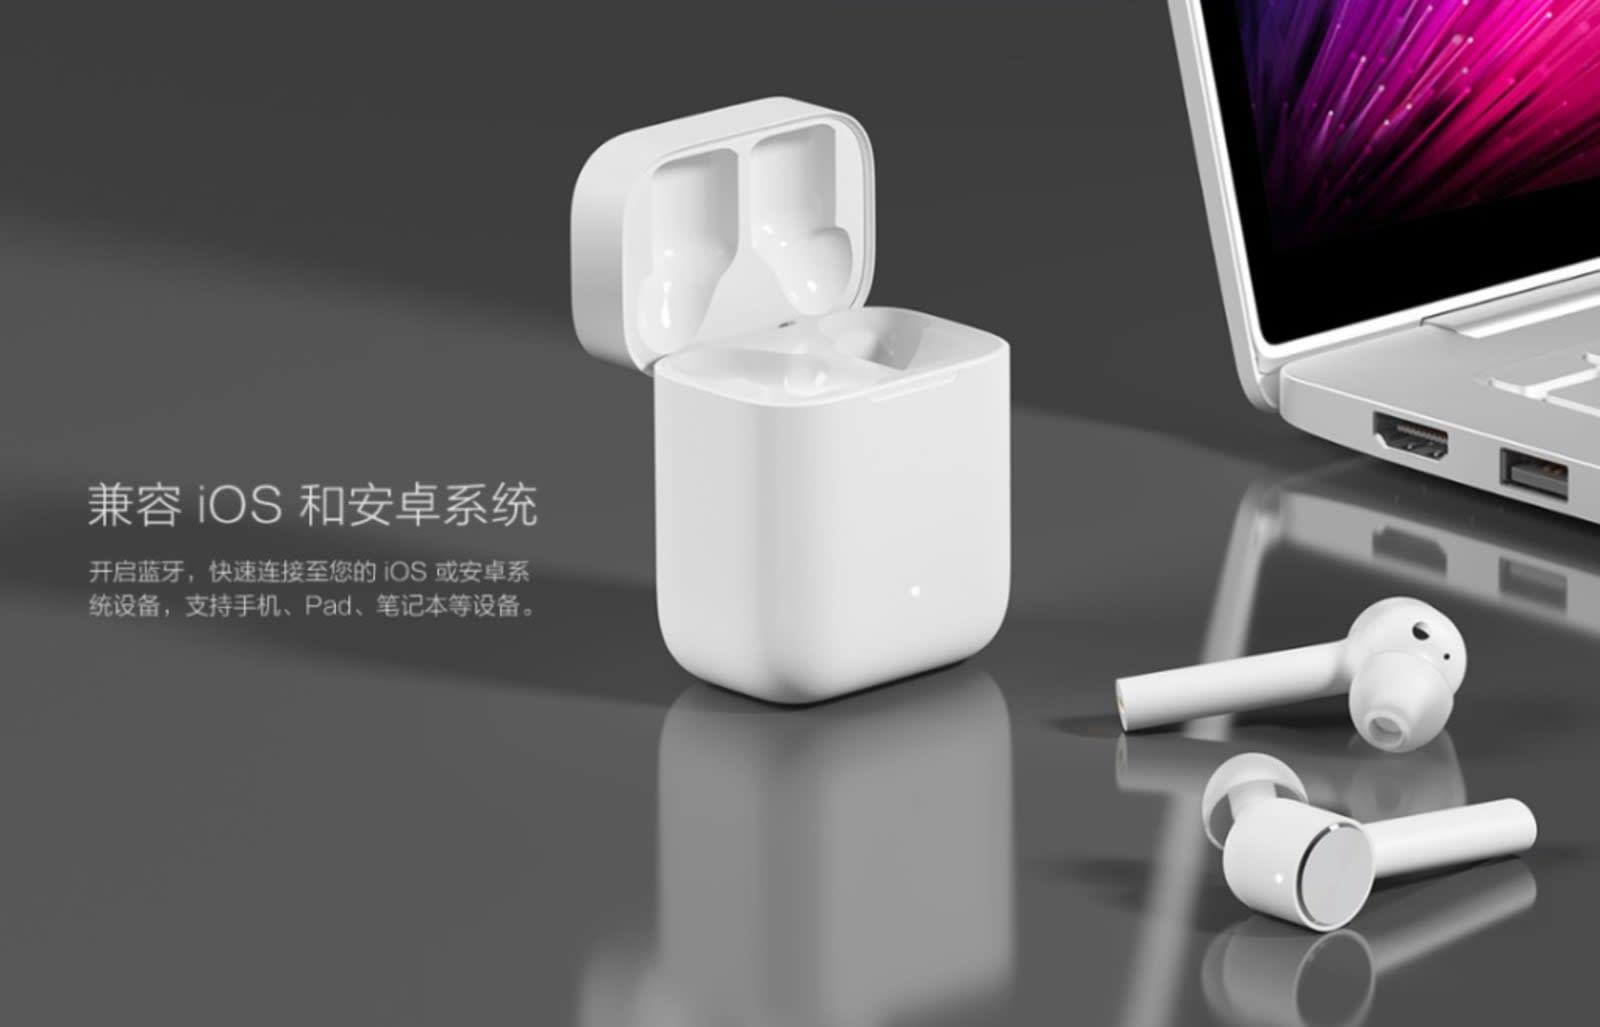 41bea6b0fe9 Xiaomi's $60 AirDots Pro are not-so-subtle AirPod clones